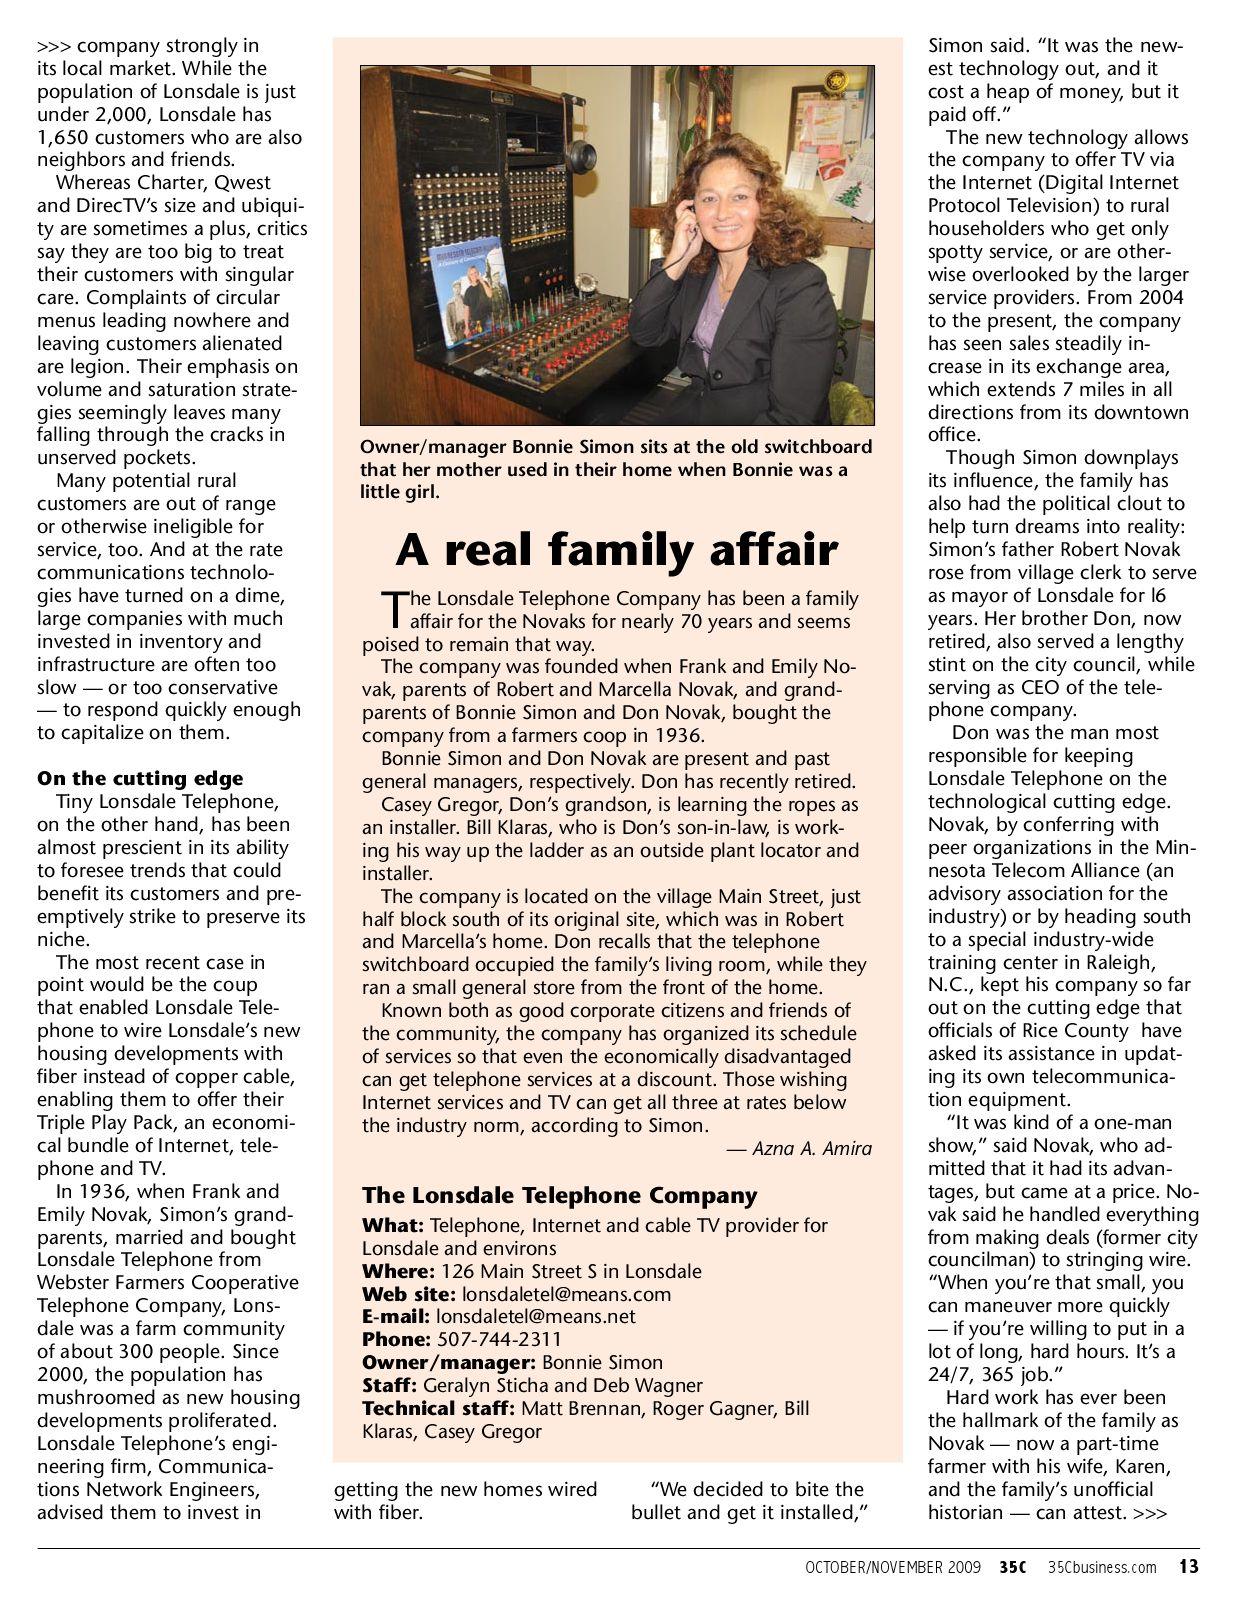 35C Oct Nov Issue by I-35 Target Media - issuu